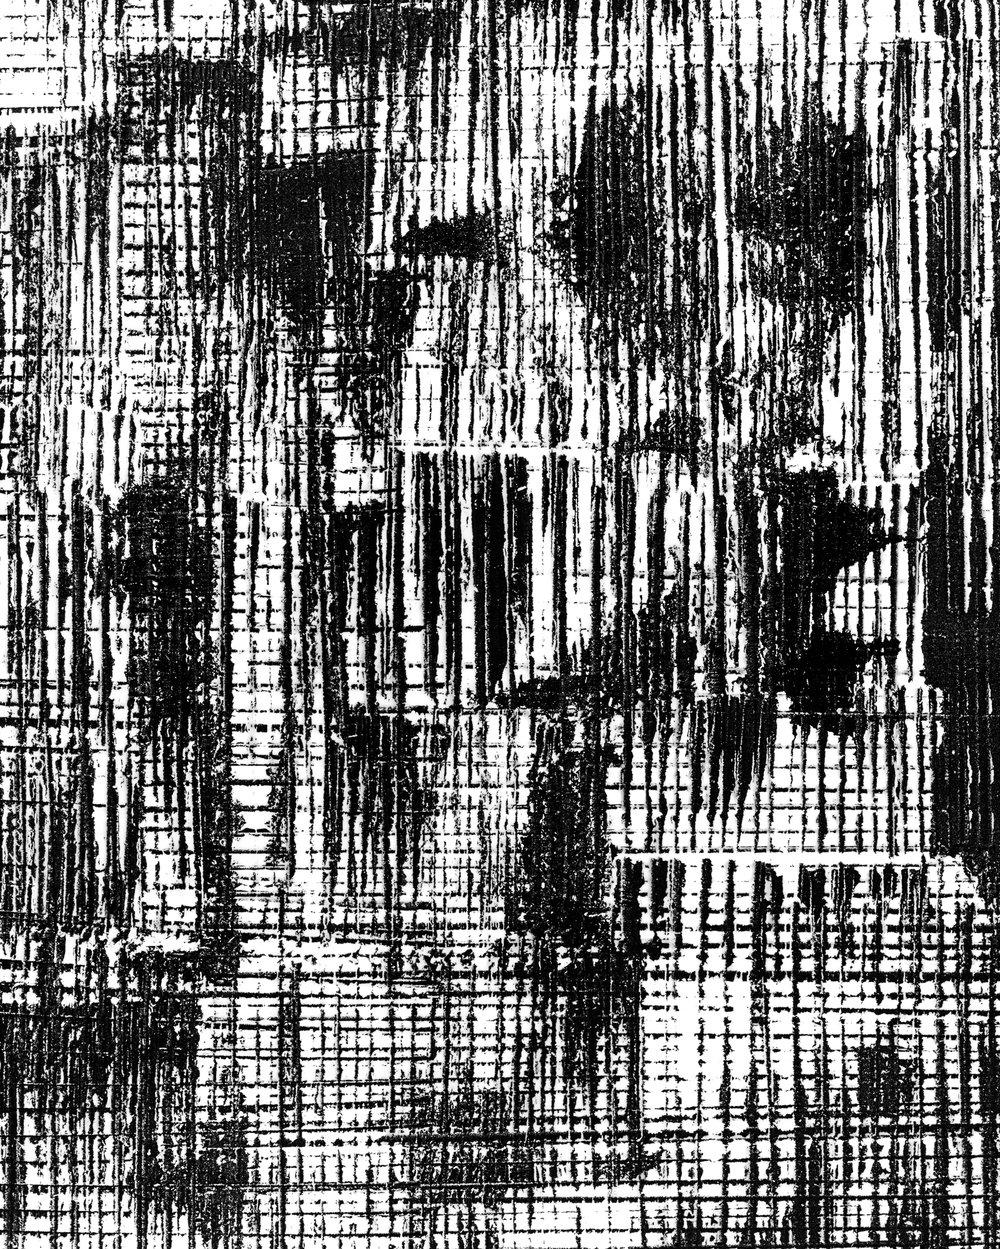 Joyce (2018). Unique photogram, selenium-toned, gelatin silver print, 51cm x 41cm.